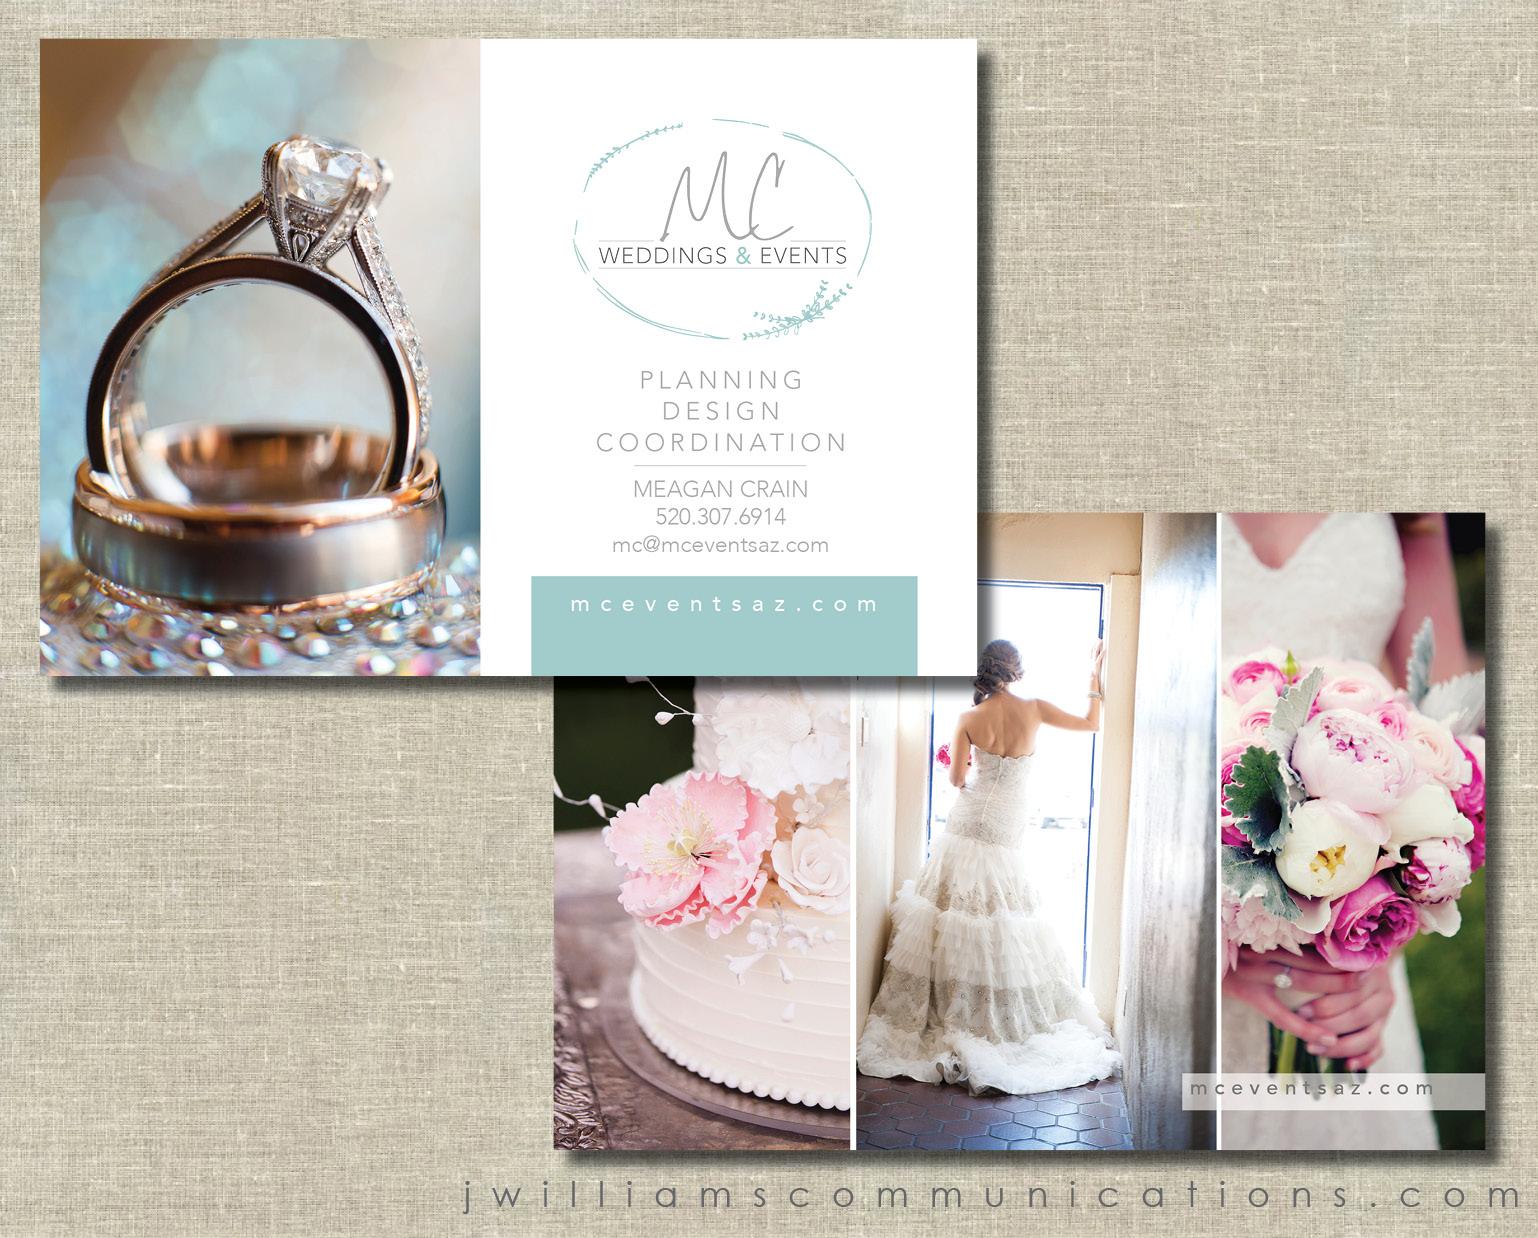 wedding planner 2-sided postcard graphic design.jpg